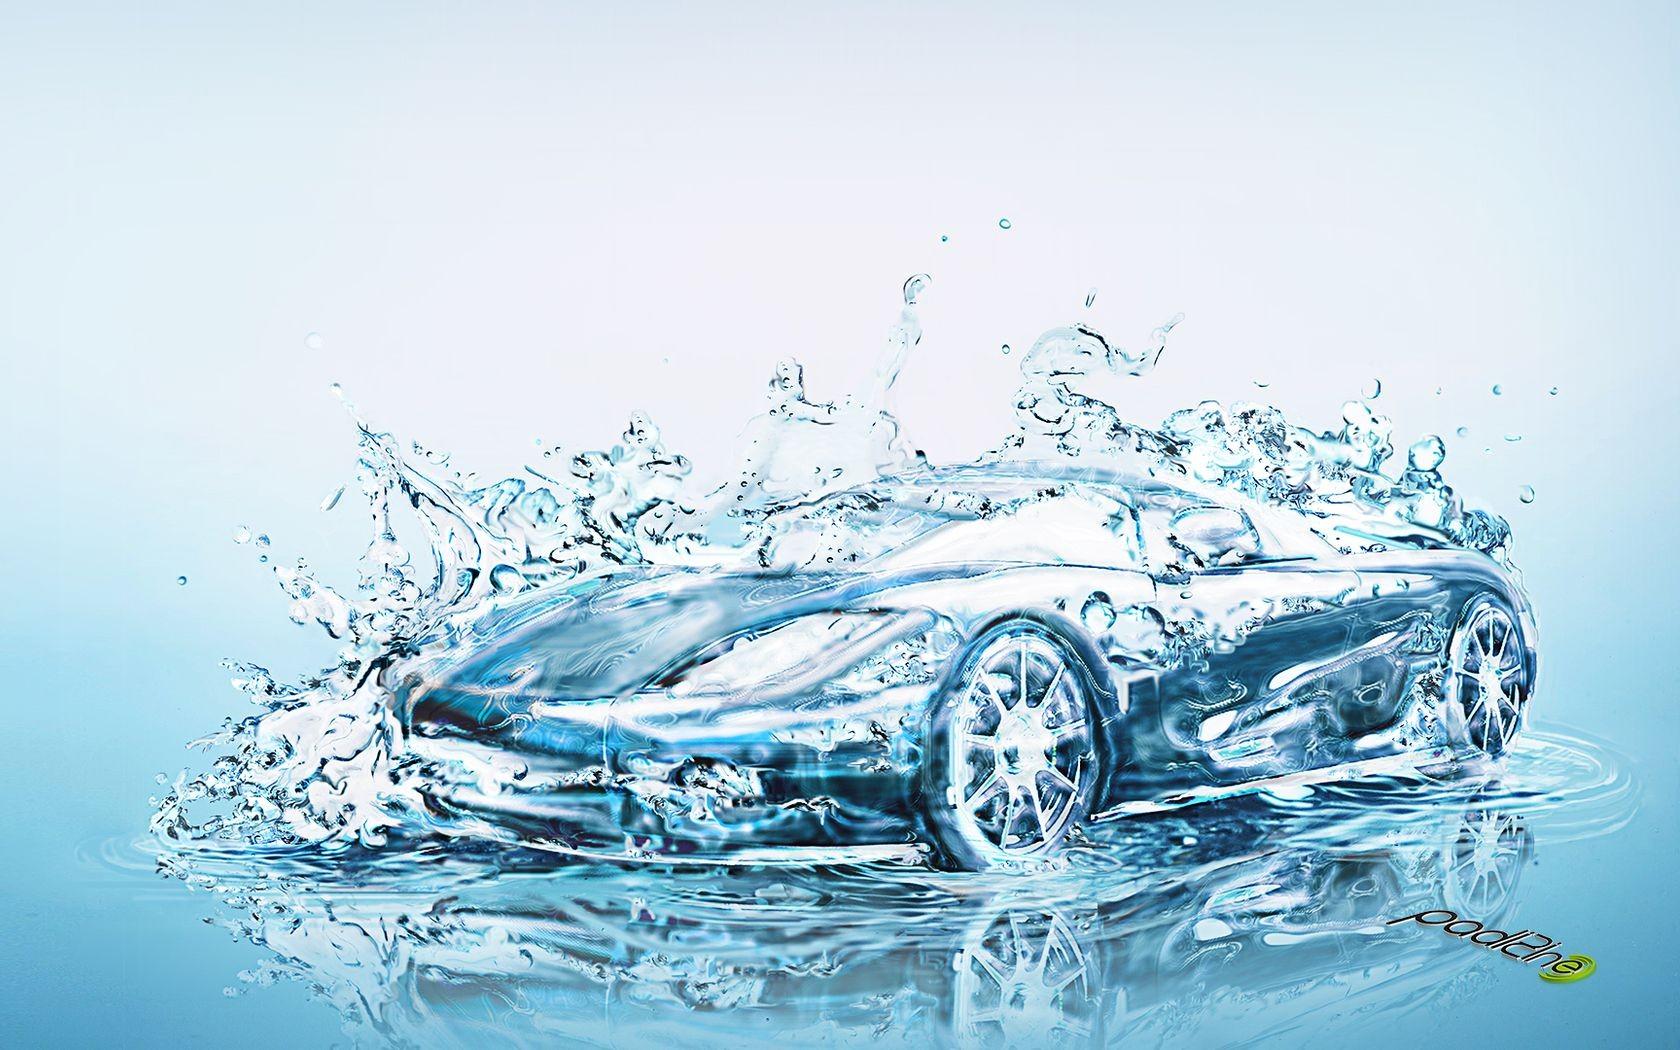 Water car wallpaper and background image 1680x1050 id - Aquatic wallpaper ...